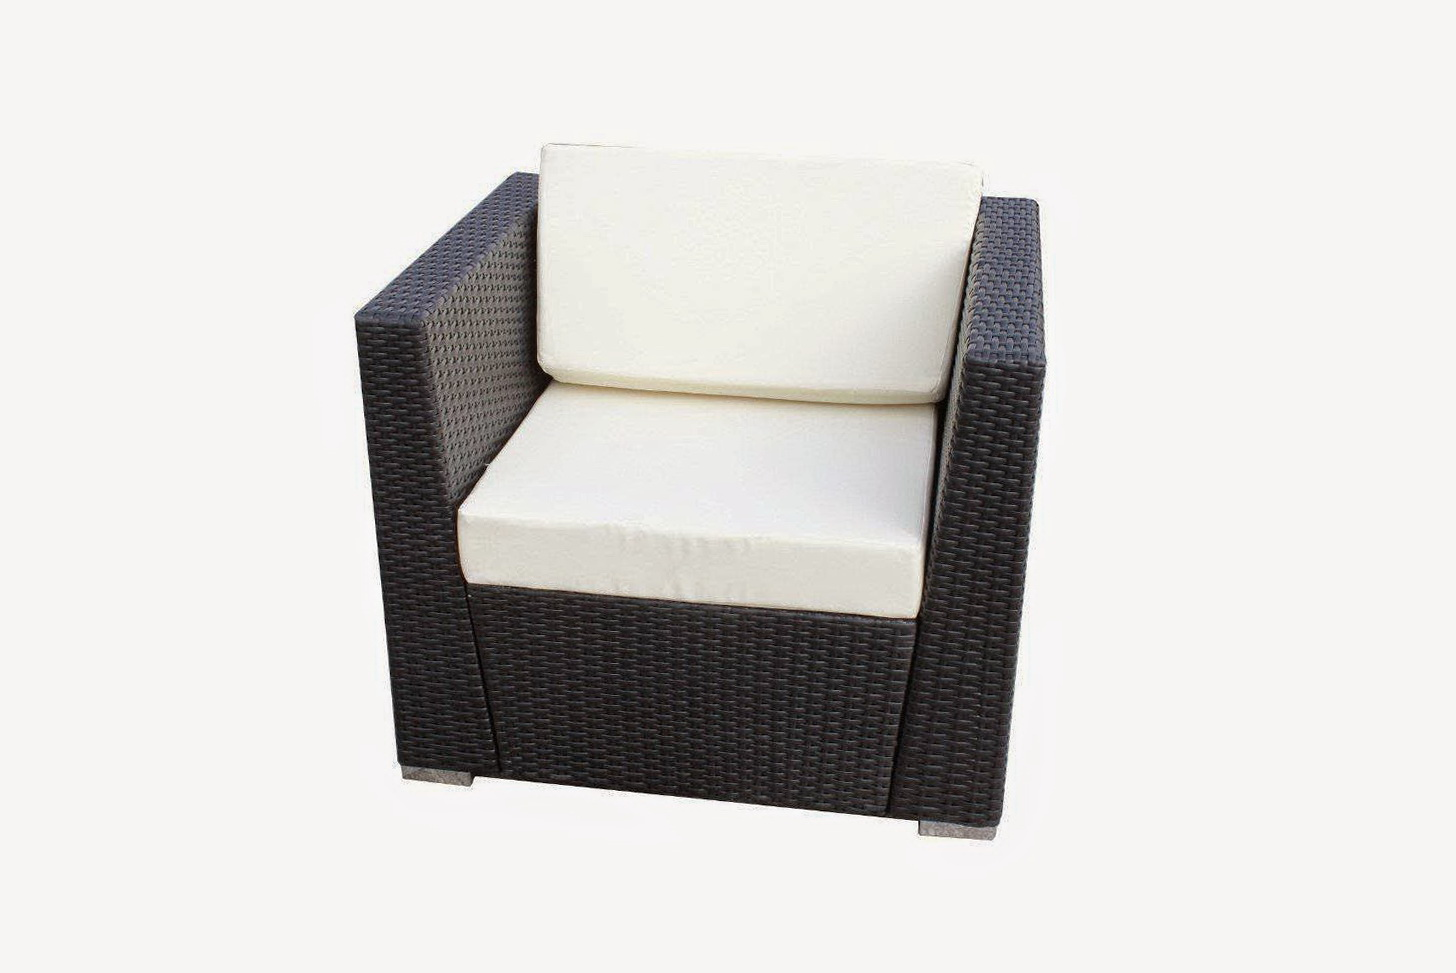 Wicker Furniture Cushions Covers